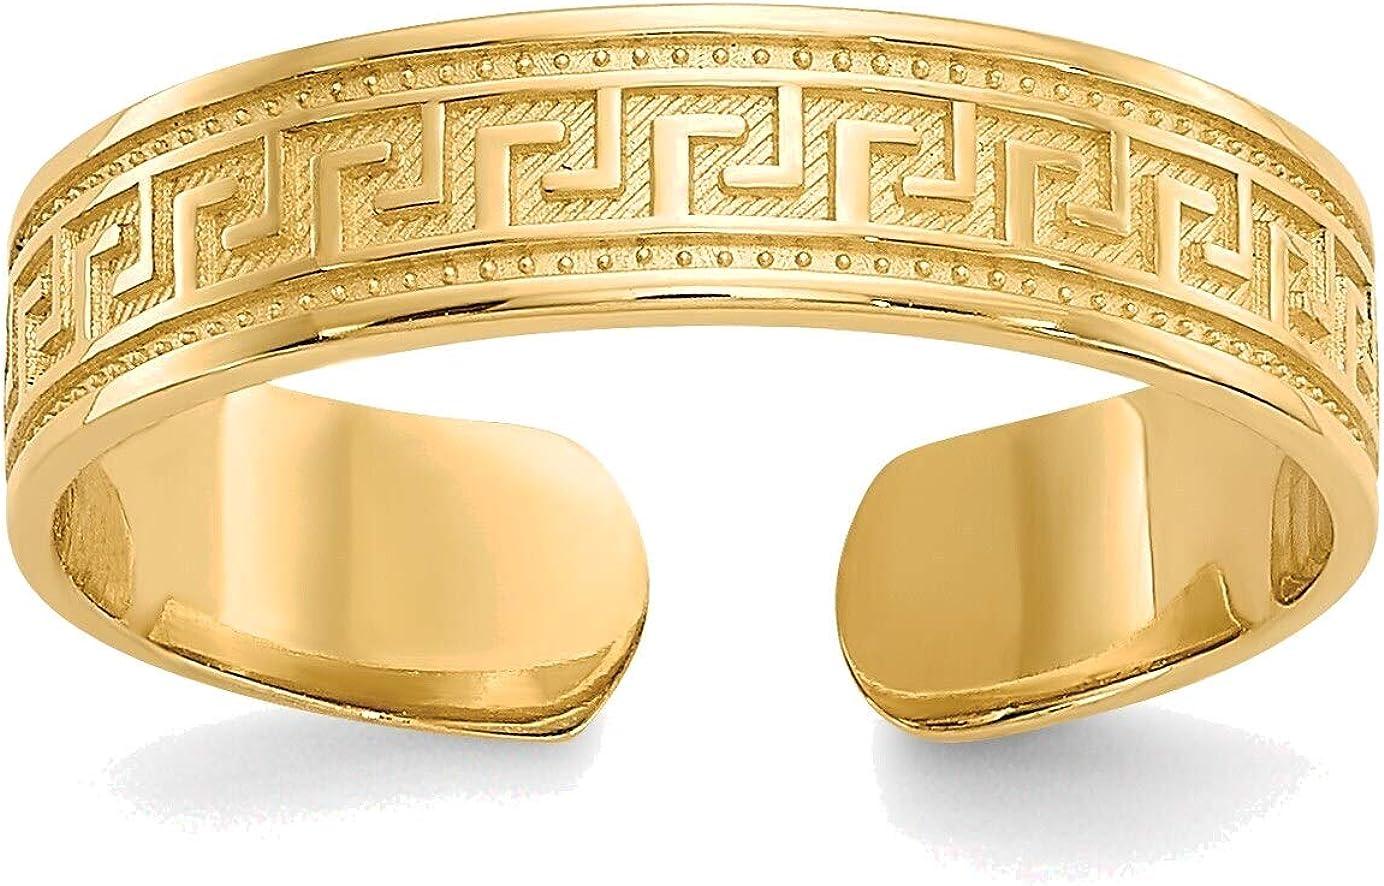 Bonyak Jewelry Greek Key Toe Ring in 14K Yellow Gold in Size 11